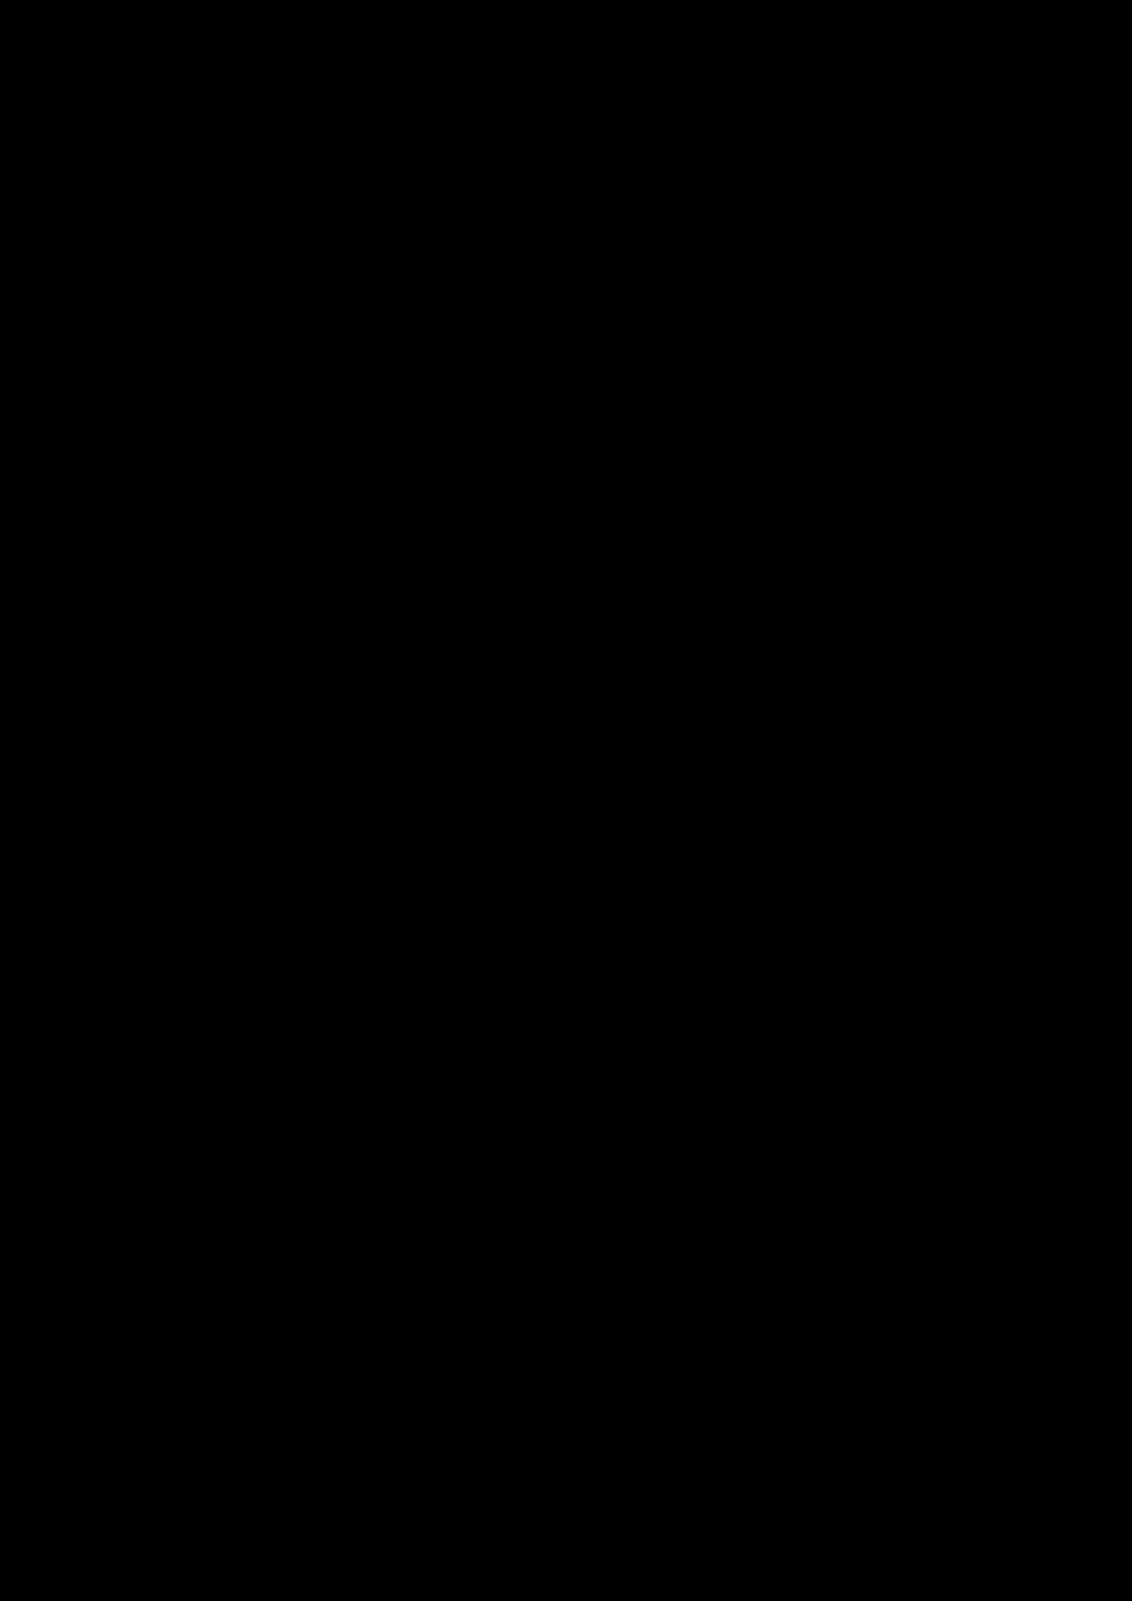 Belyiy sokol slide, Image 190